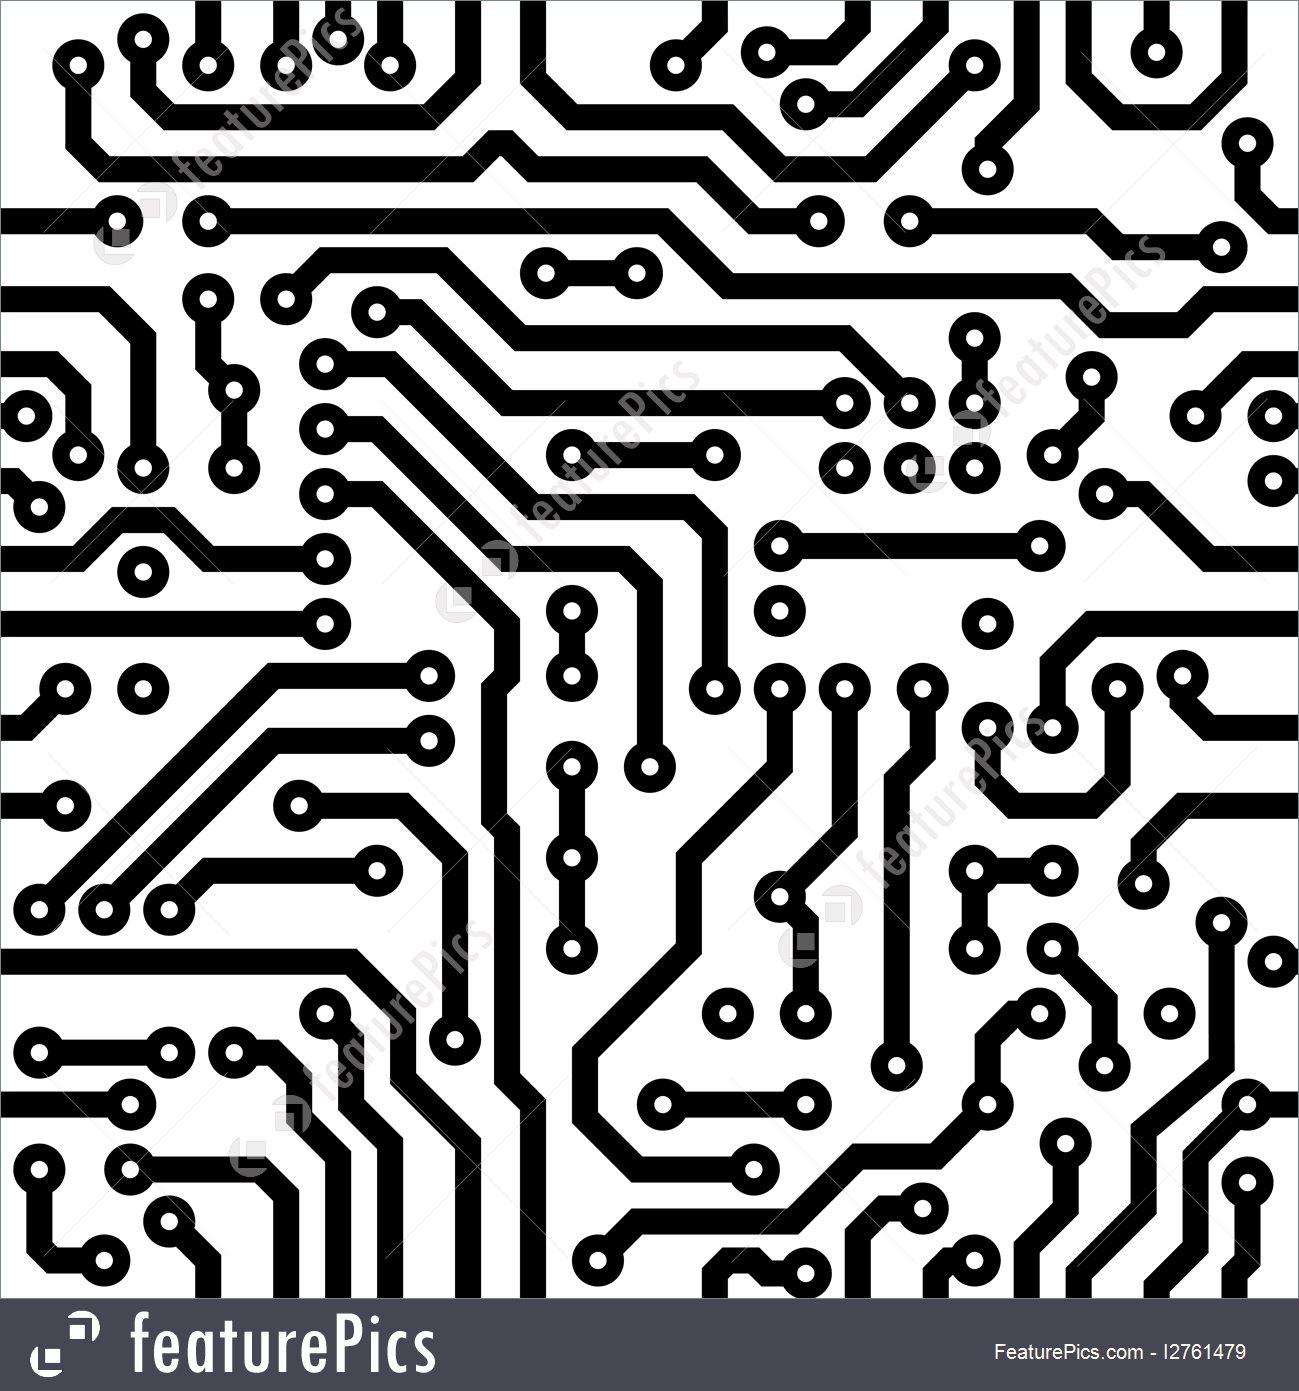 1299x1391 Technology Seamless Circuit Board